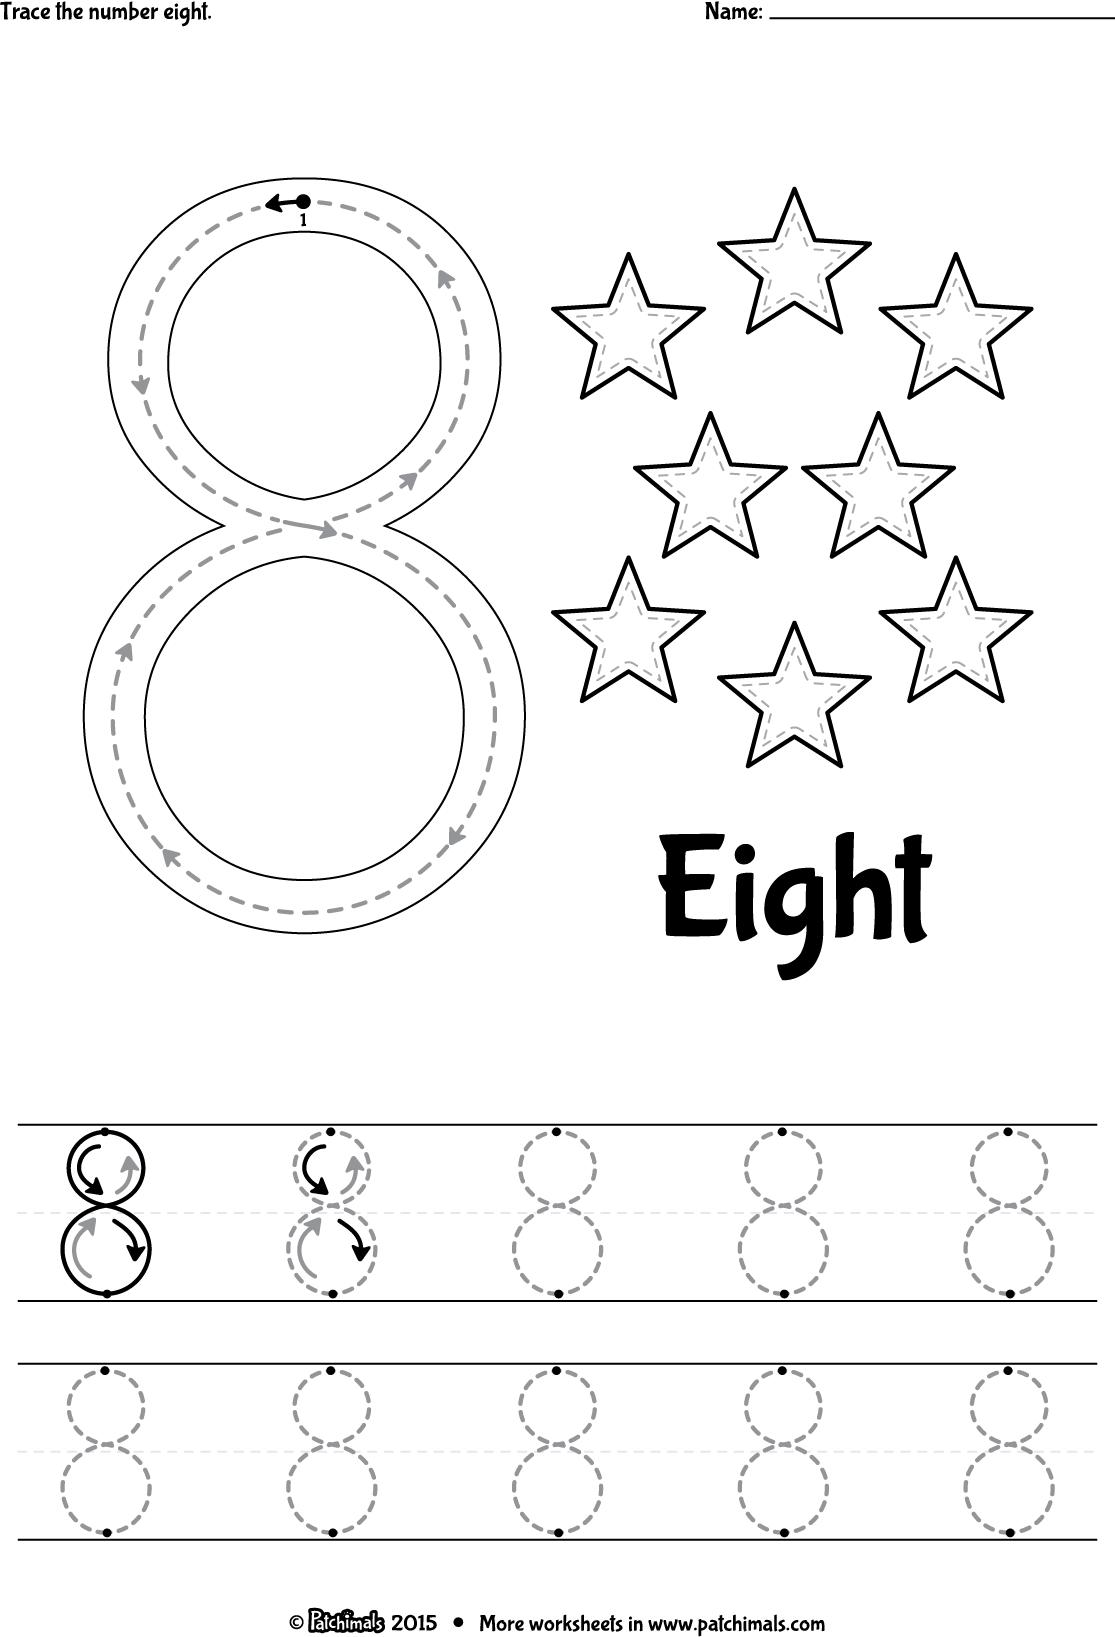 Tracing Number 8 Worksheets